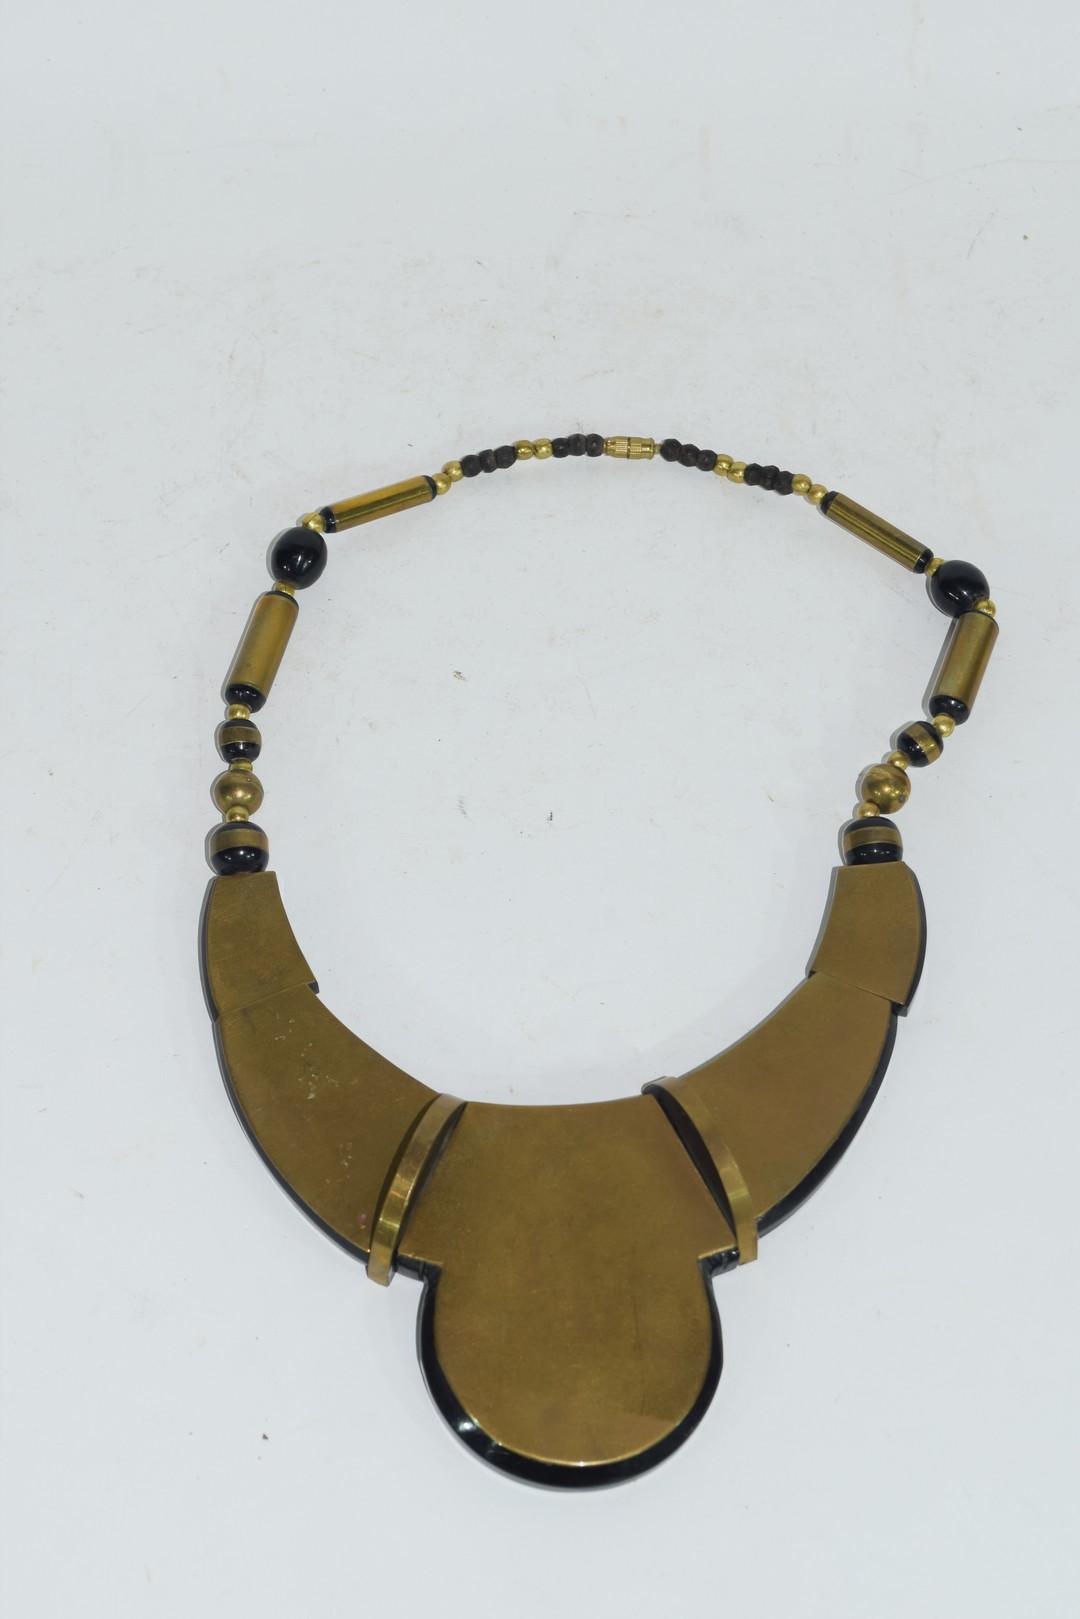 Tortoiseshell style Art Deco necklace